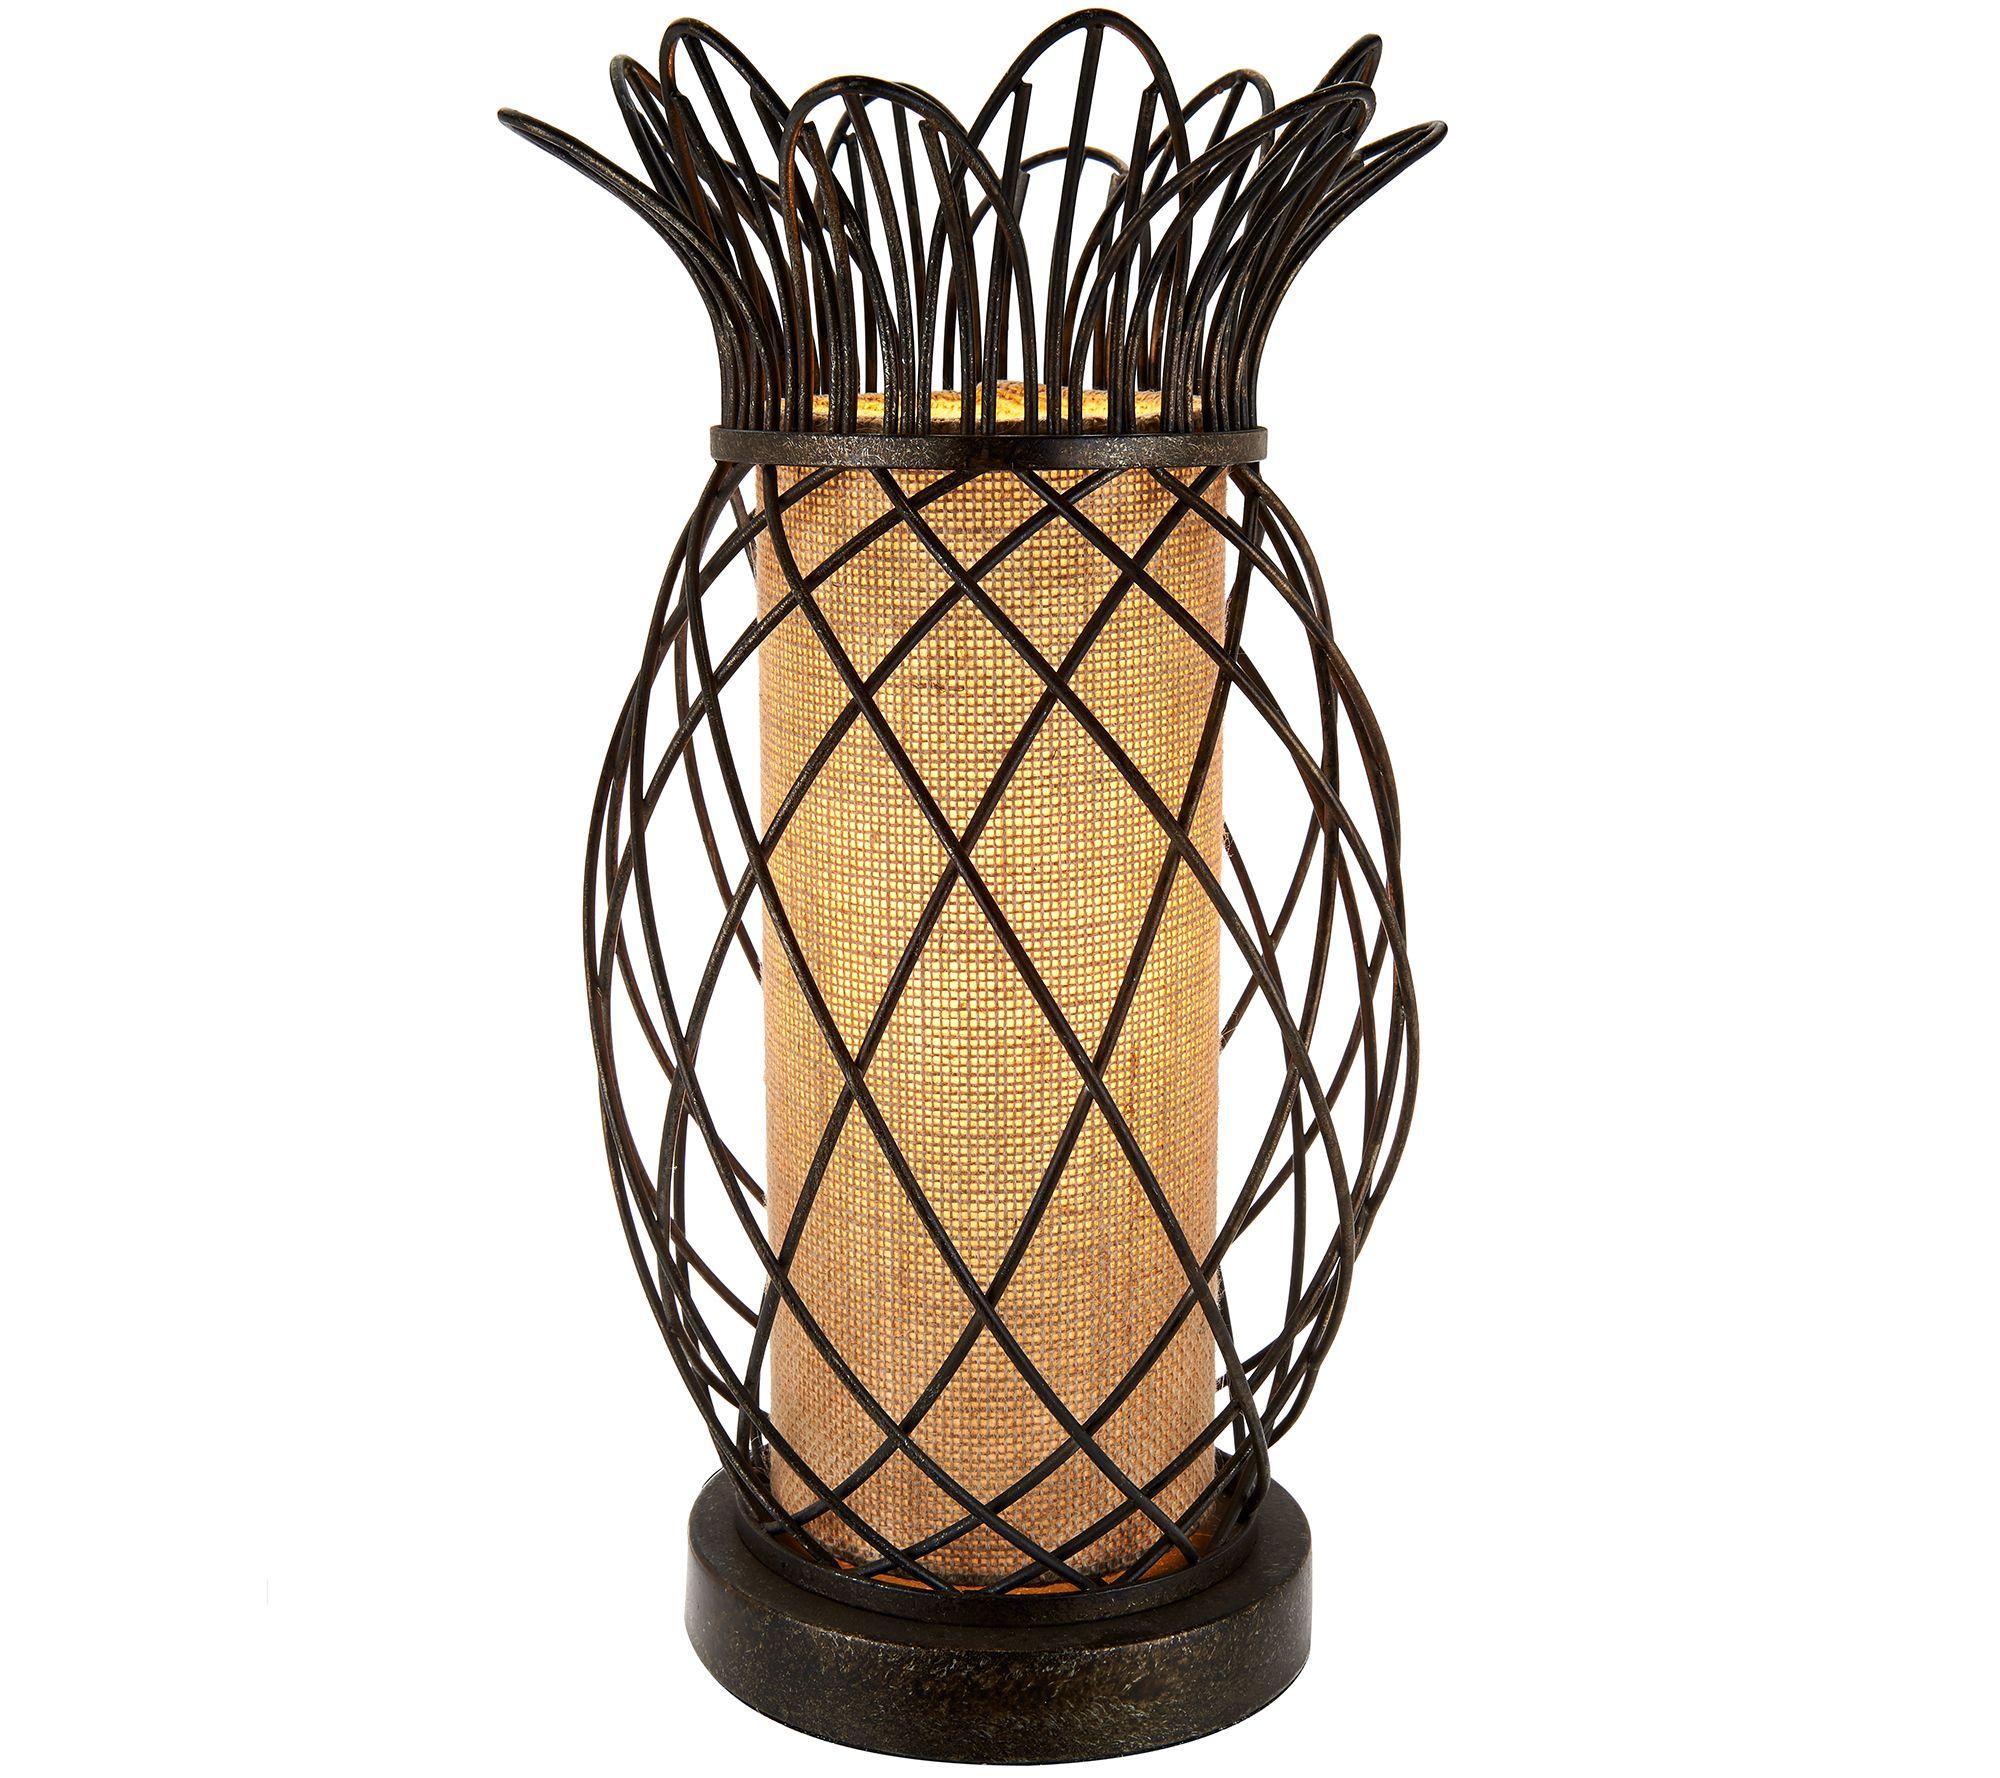 Antiqued Bronze Metal Pineapple Plug In Lamp By Valerie   Page 1 U2014 QVC.com